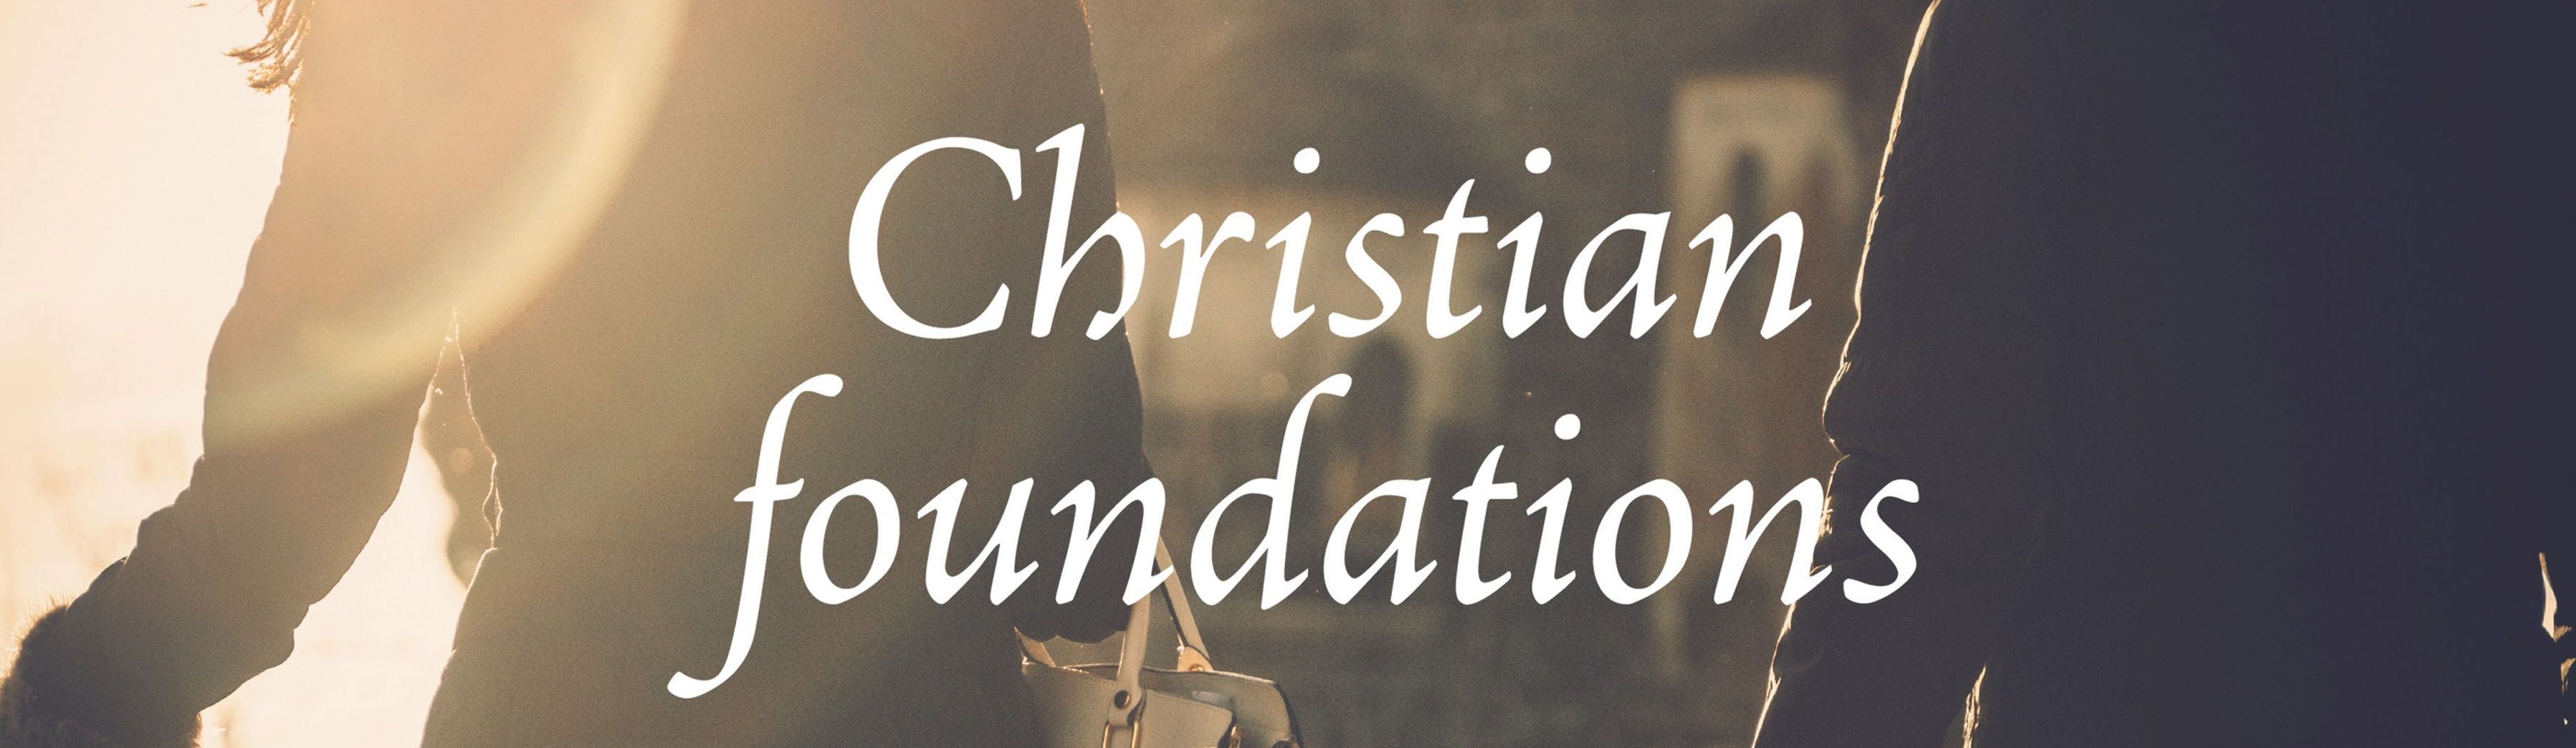 Christian Foundations banner